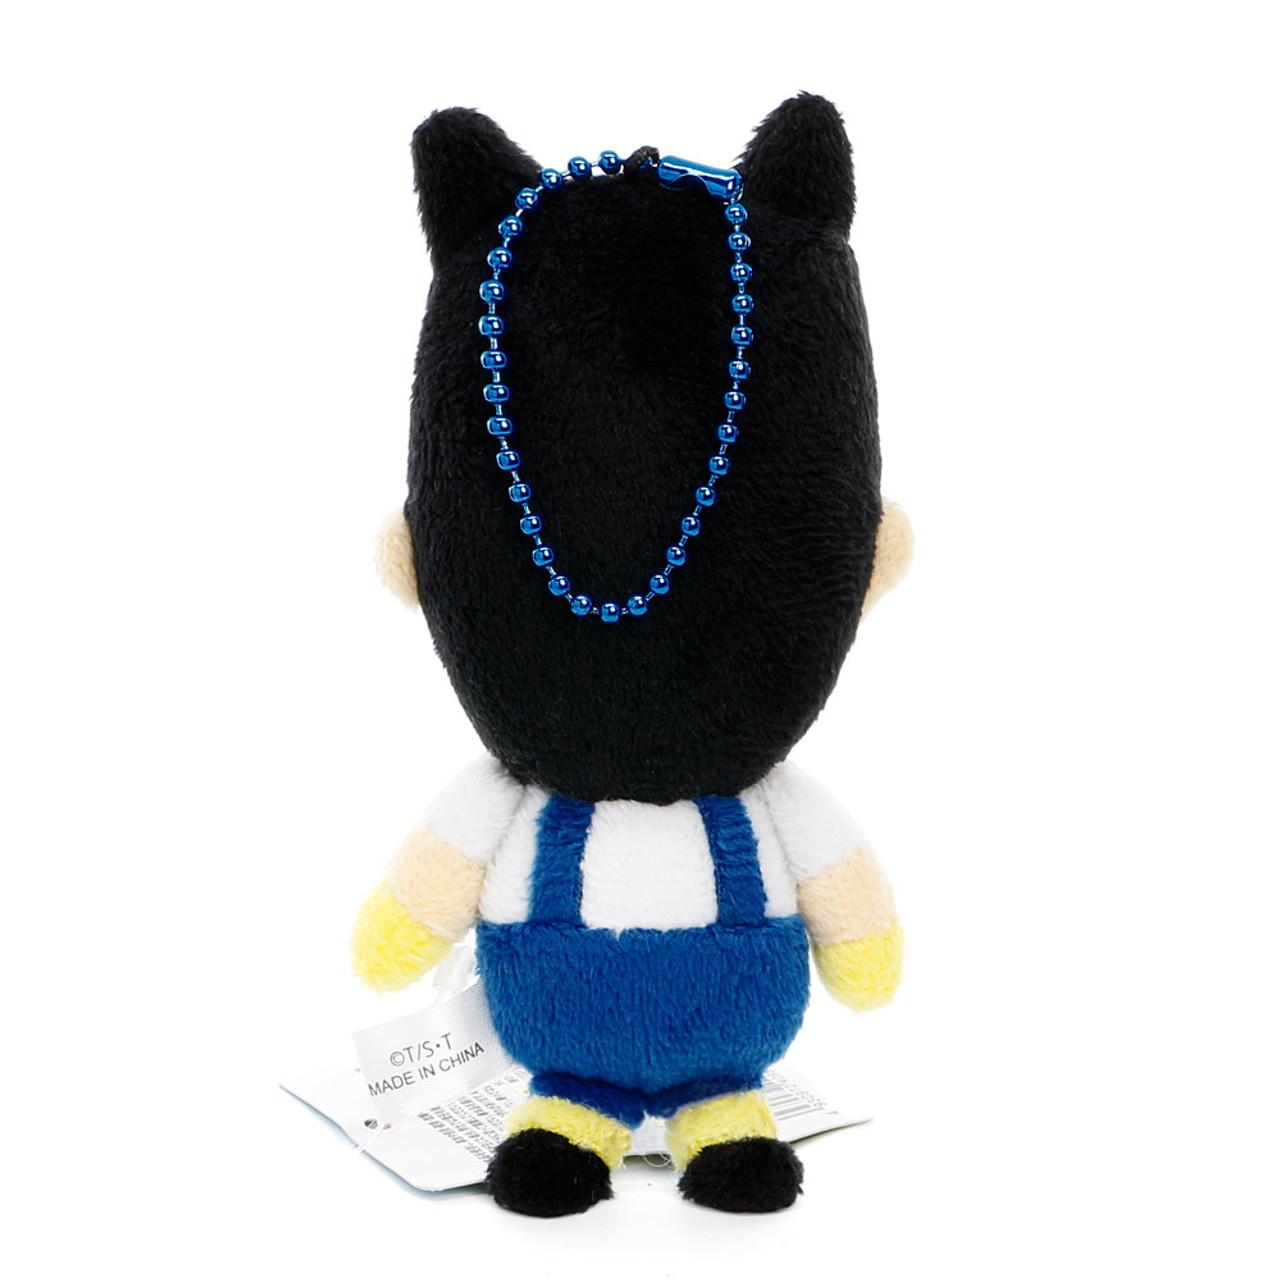 Obotchaman Mascot Plush Charms ( Back View )